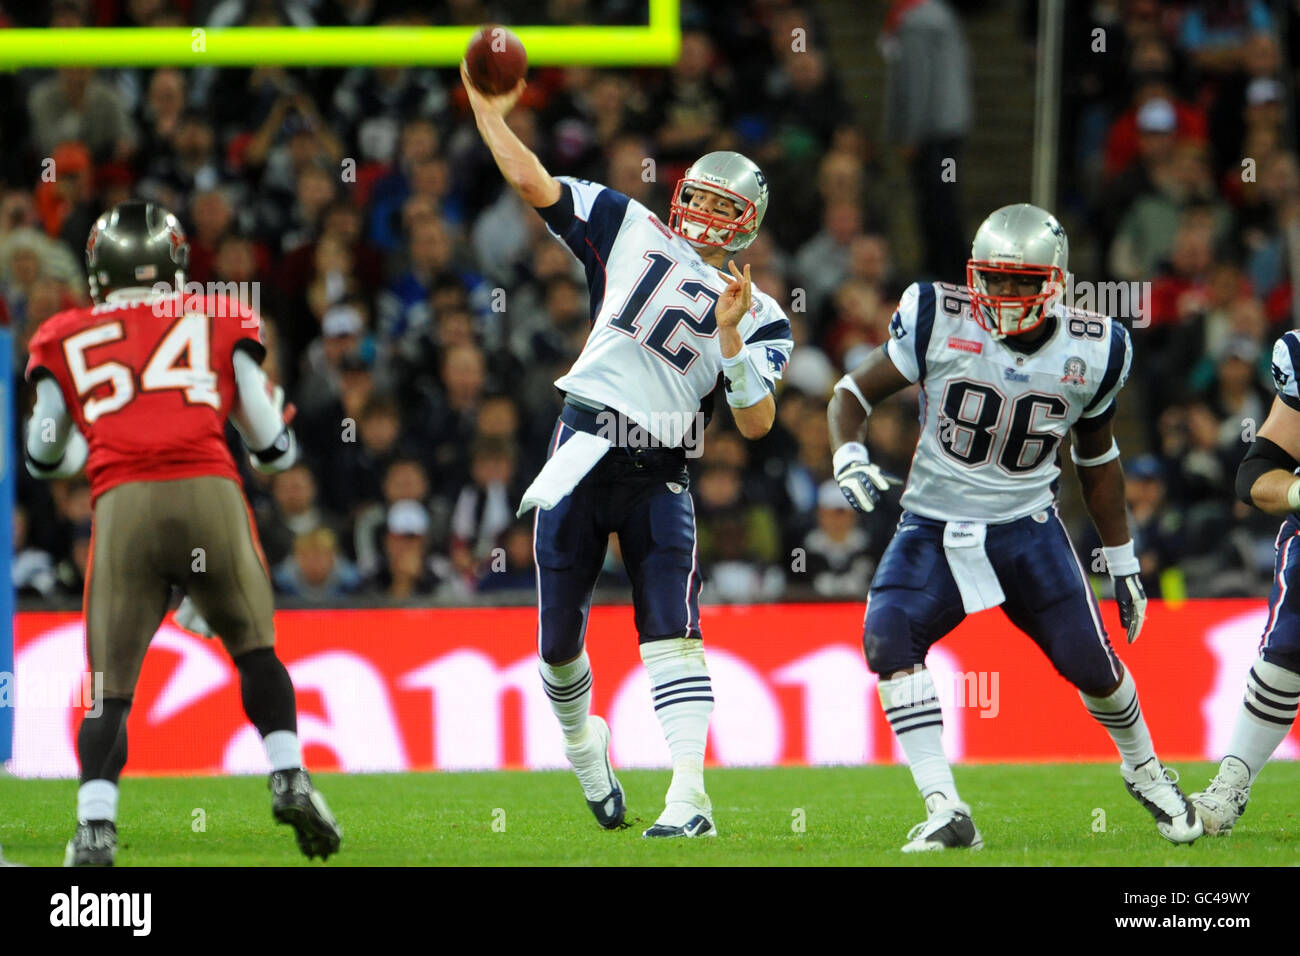 American Football - NFL - New England Patriots v Tampa Bay Buccaneers - Wembley Stadium - Stock Image